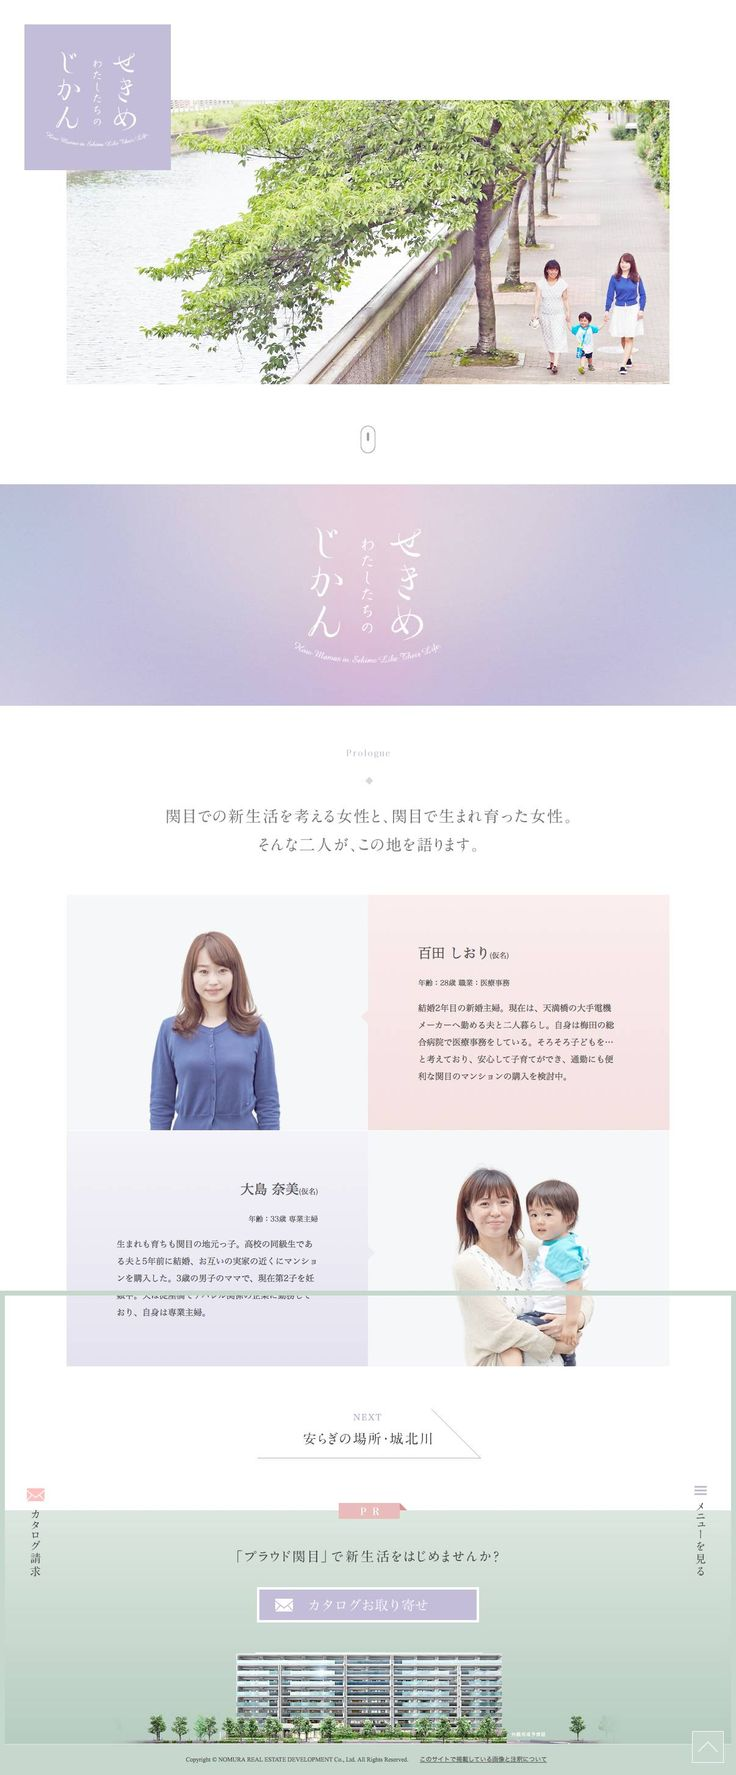 http://www.proud-web.jp/kansai/mansion/sekime/sekimejikan/index.html